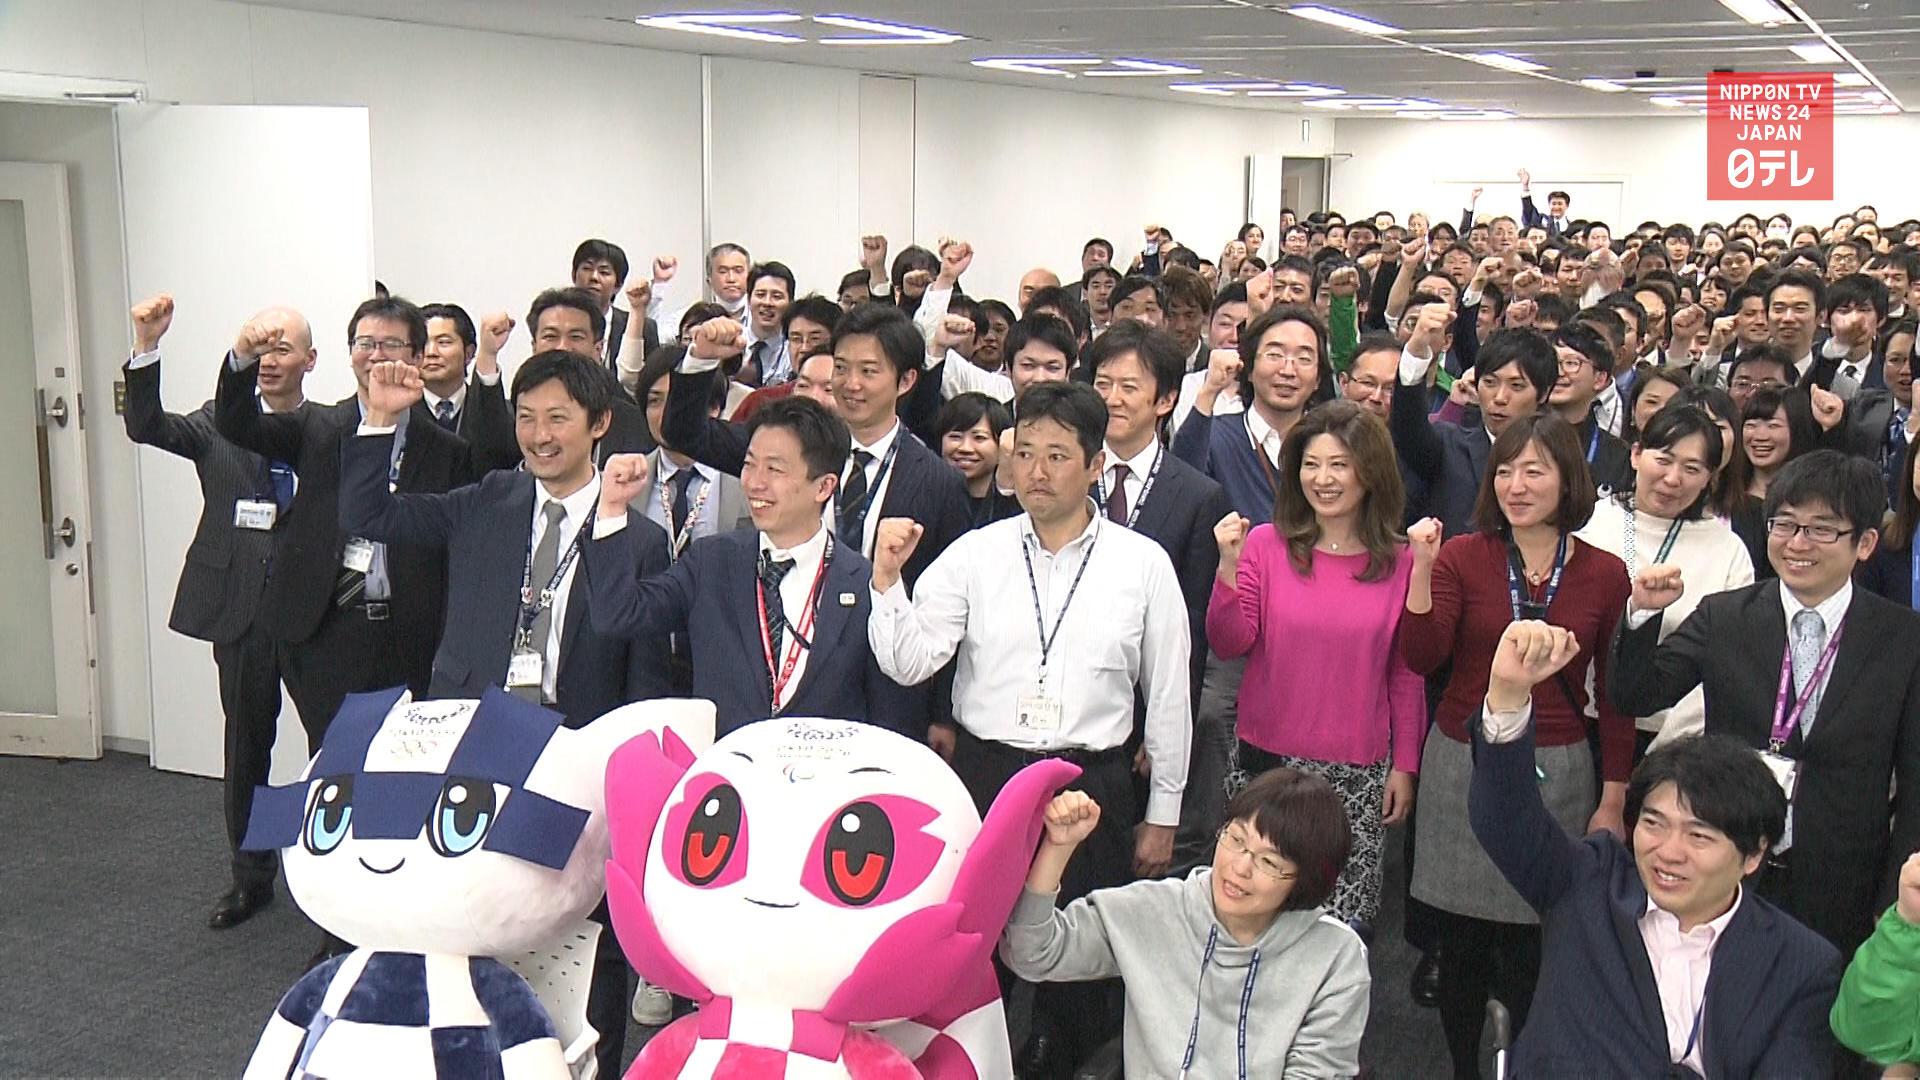 Revving up for Tokyo Games